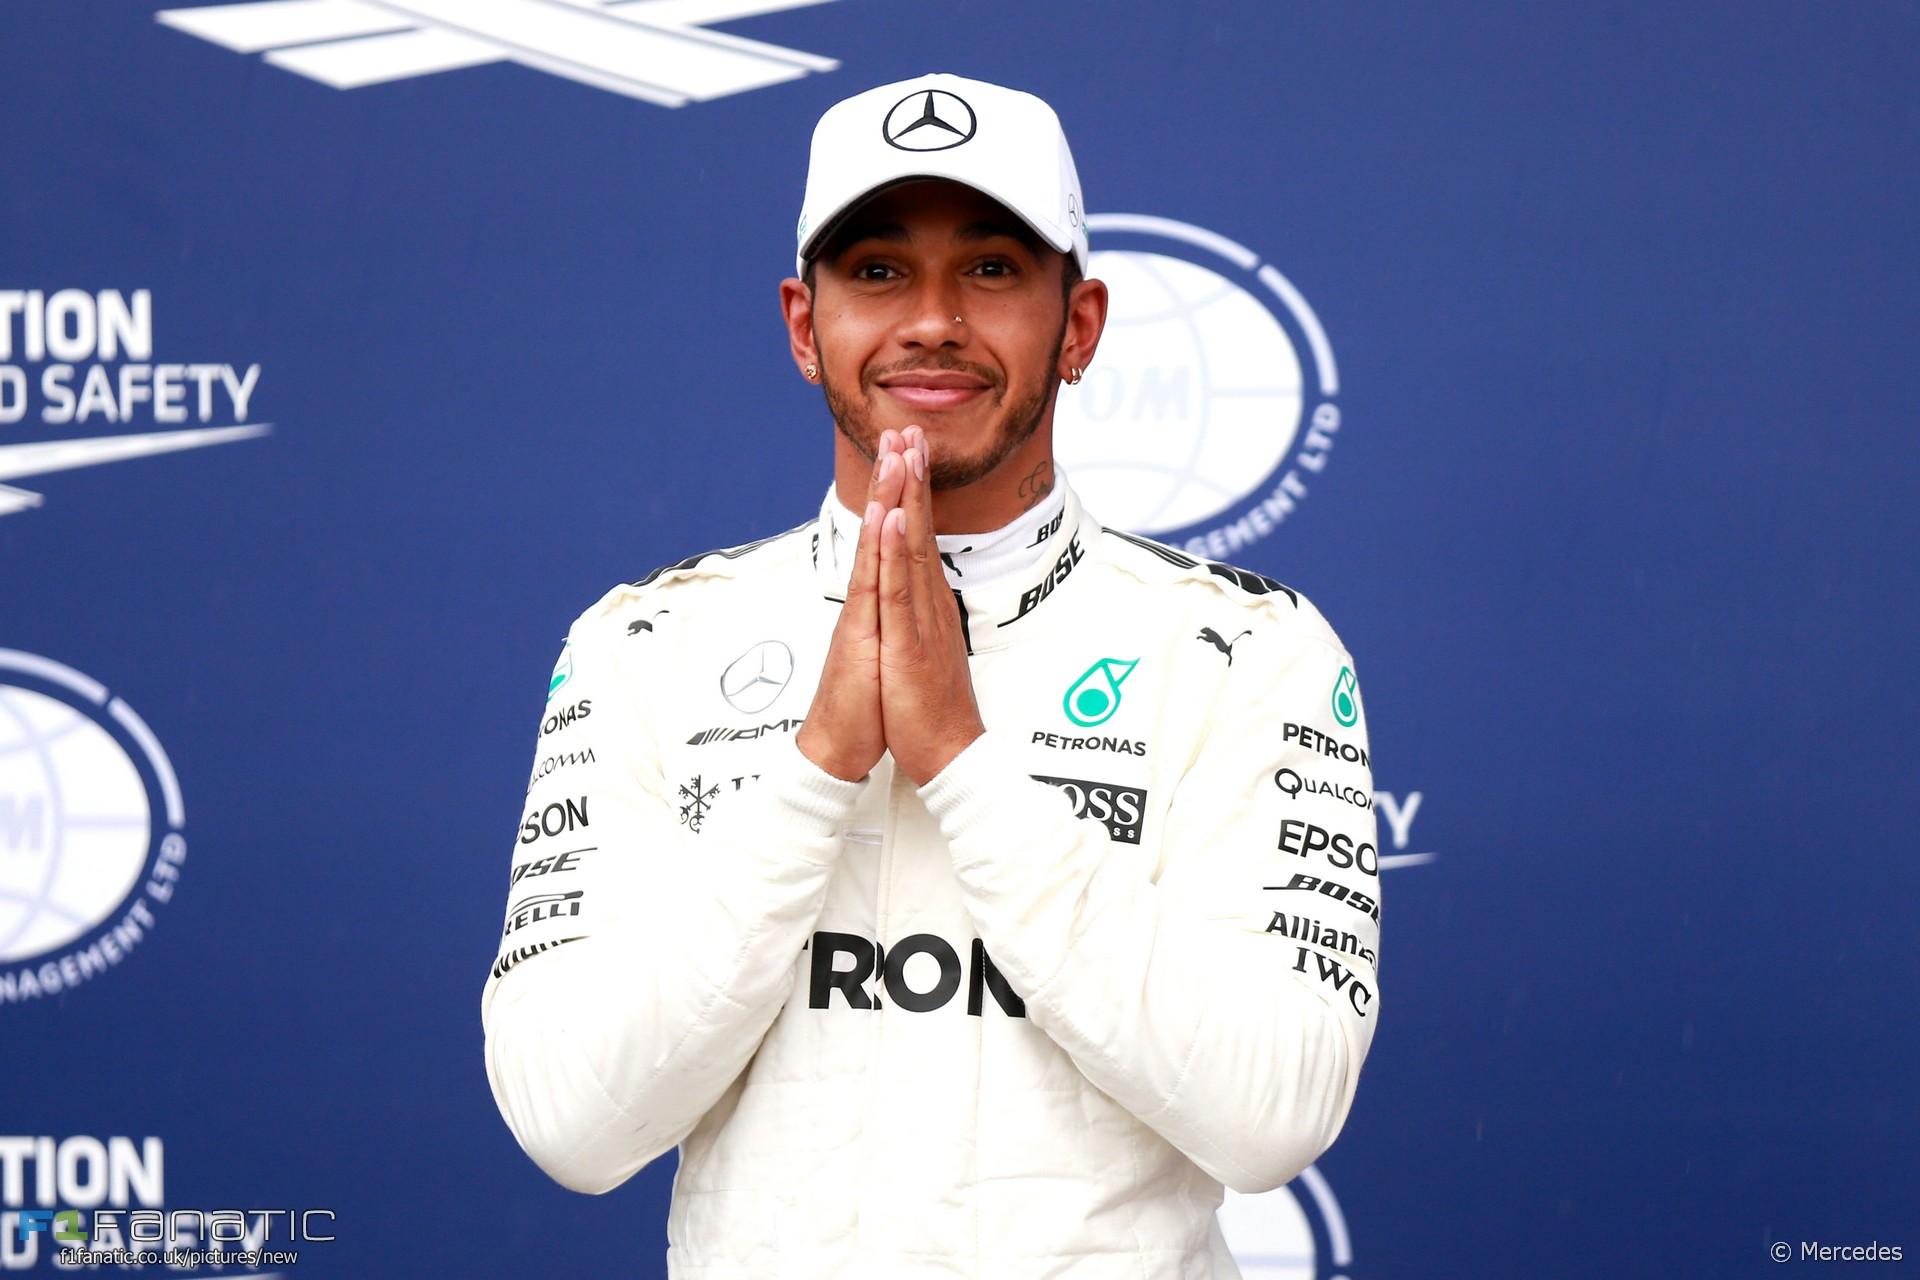 Lewis Hamilton, Mercedes, Monza, 2017